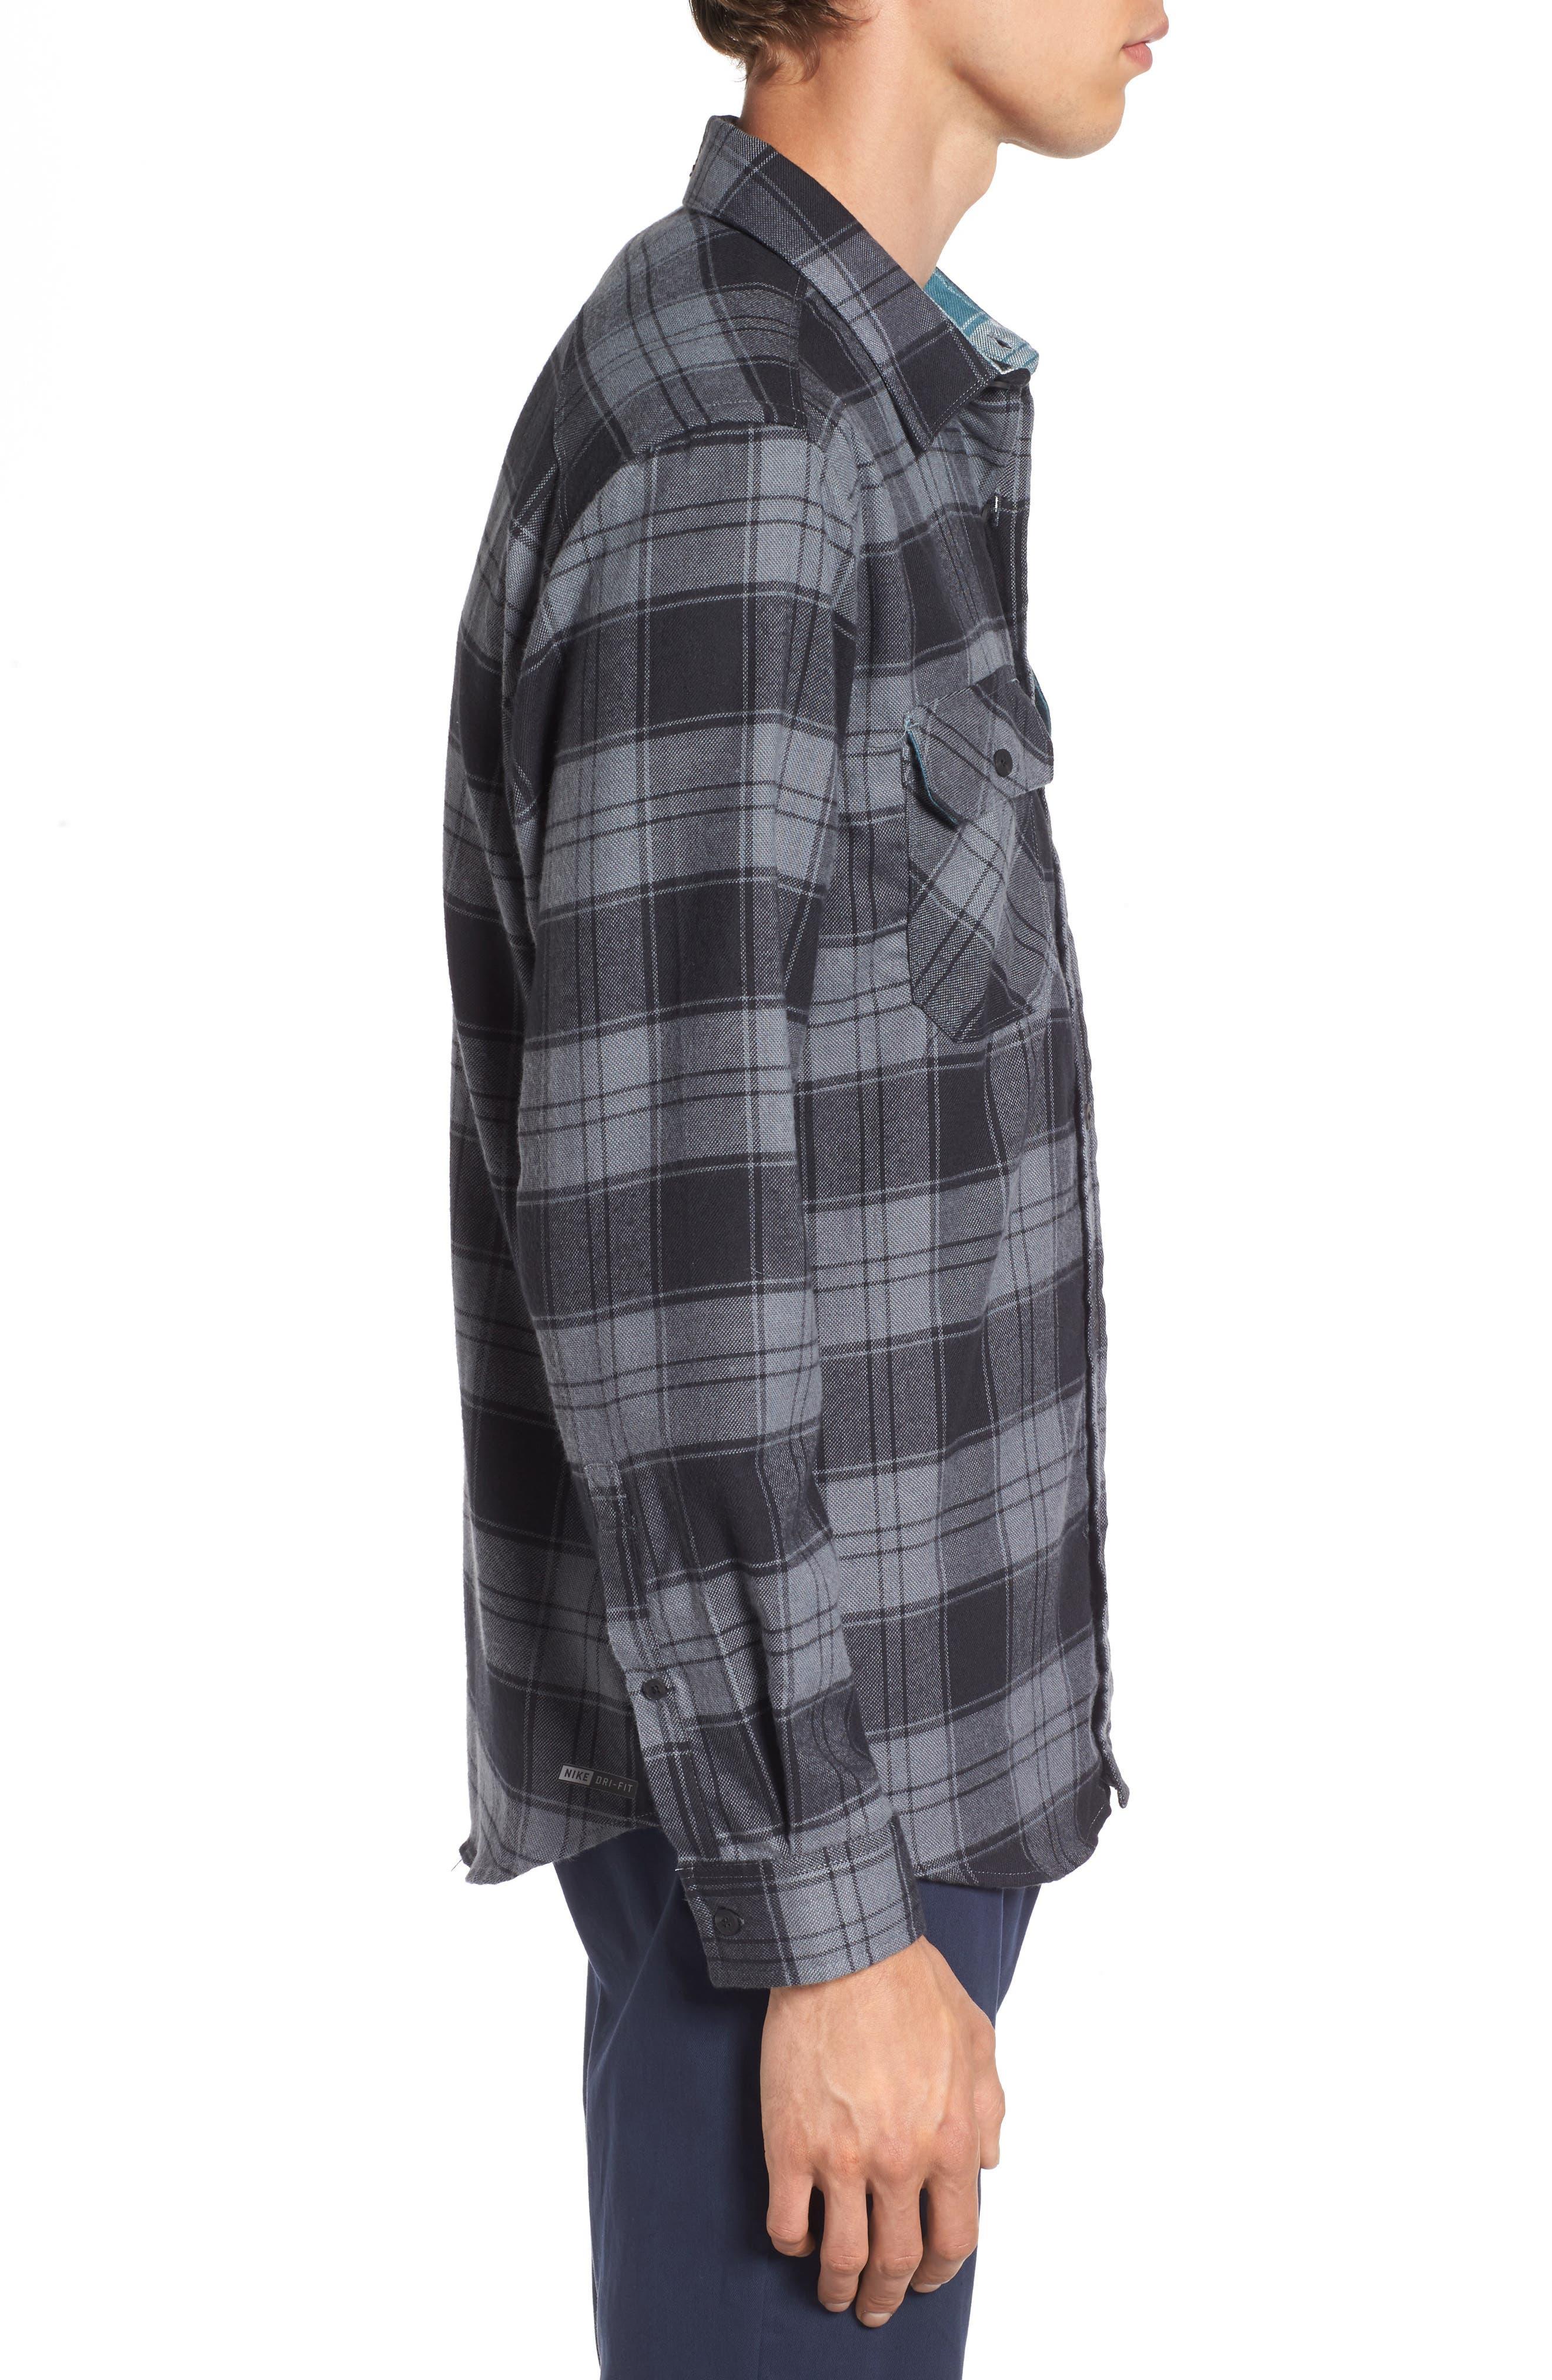 Alternate Image 3  - Hurley Check Dri-FIT Shirt